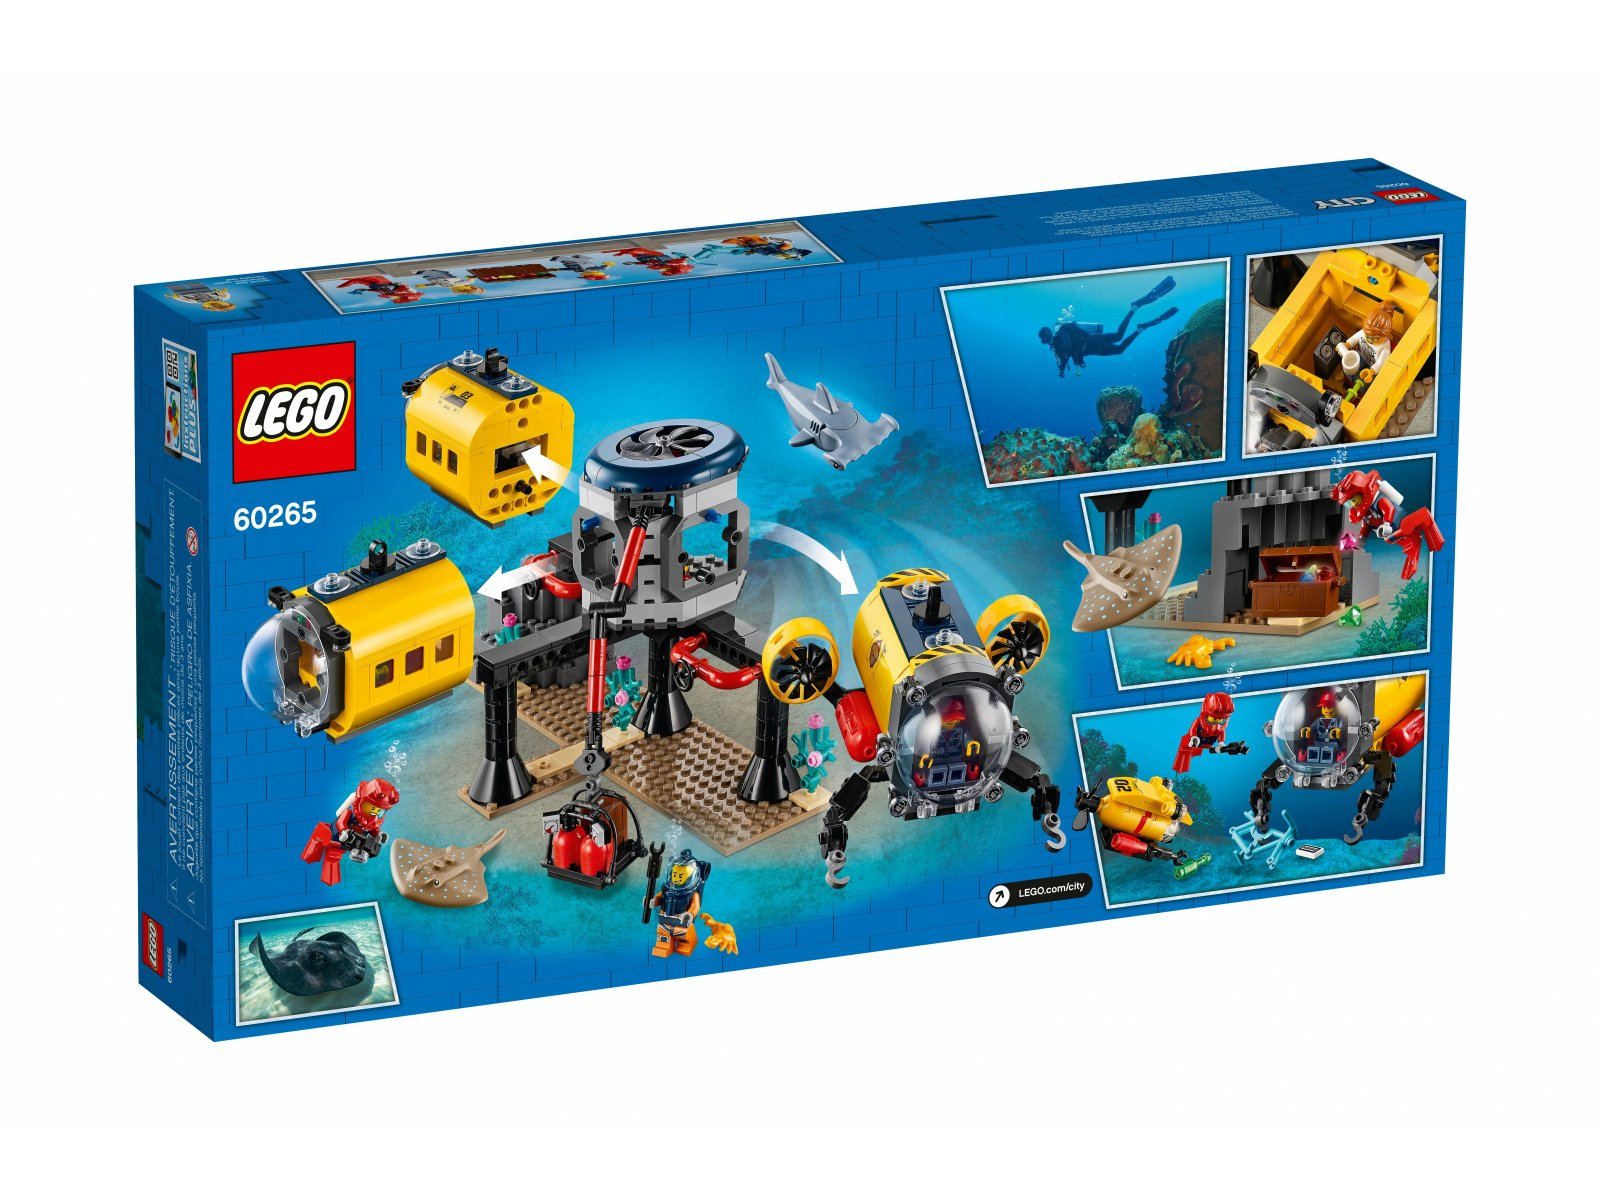 LEGO 60265 City Baza badaczy oceanu